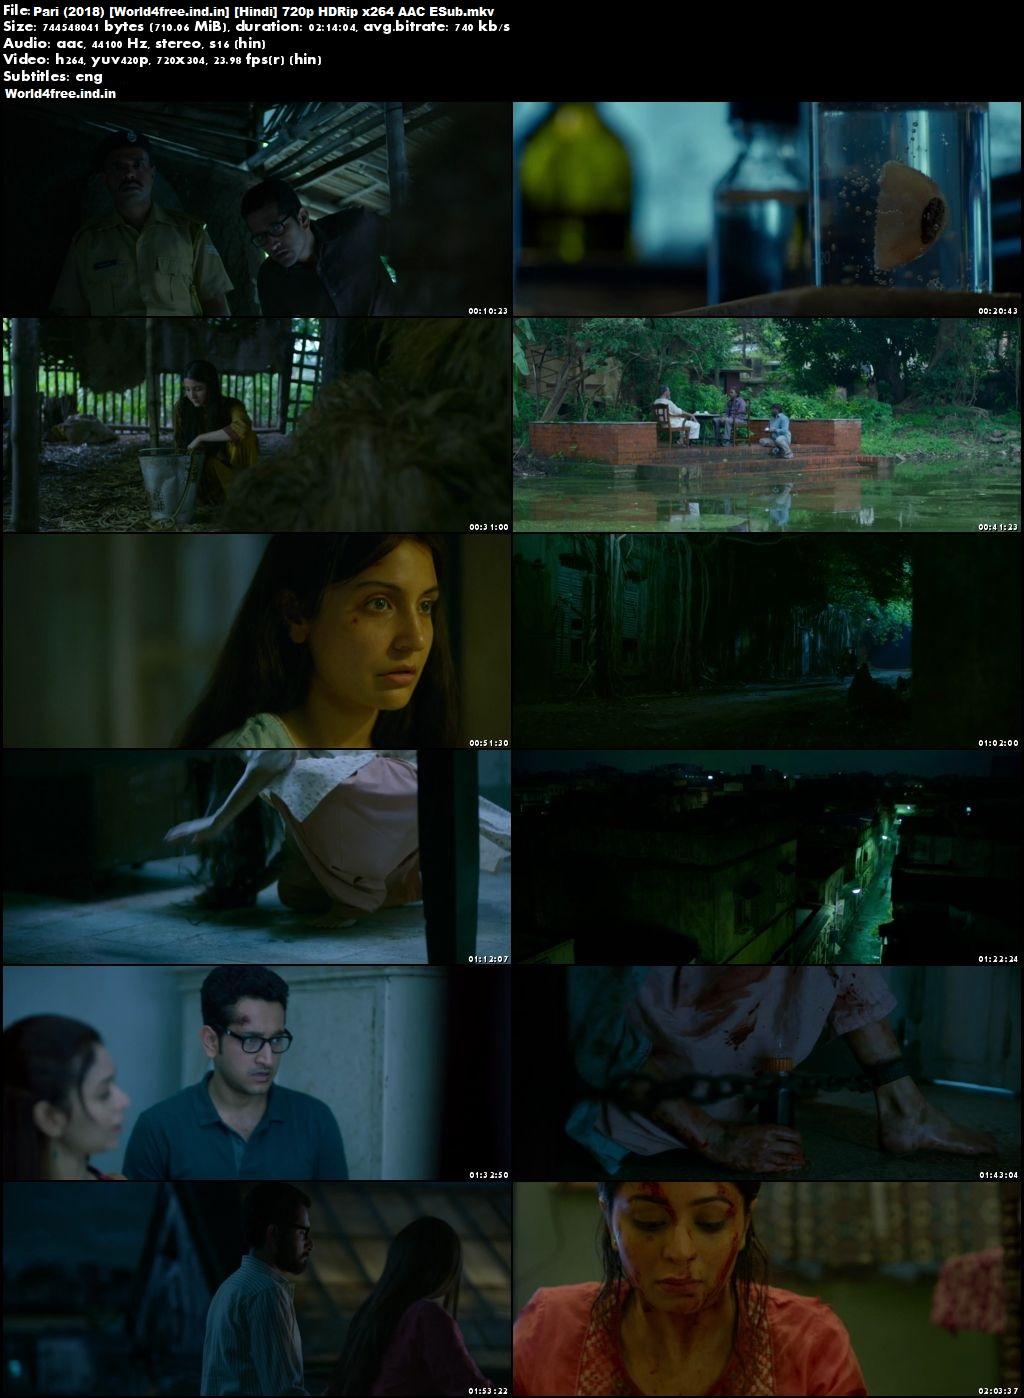 Pari 2018 world4free.ind.in HDRip 720p Full Hindi Movie Download